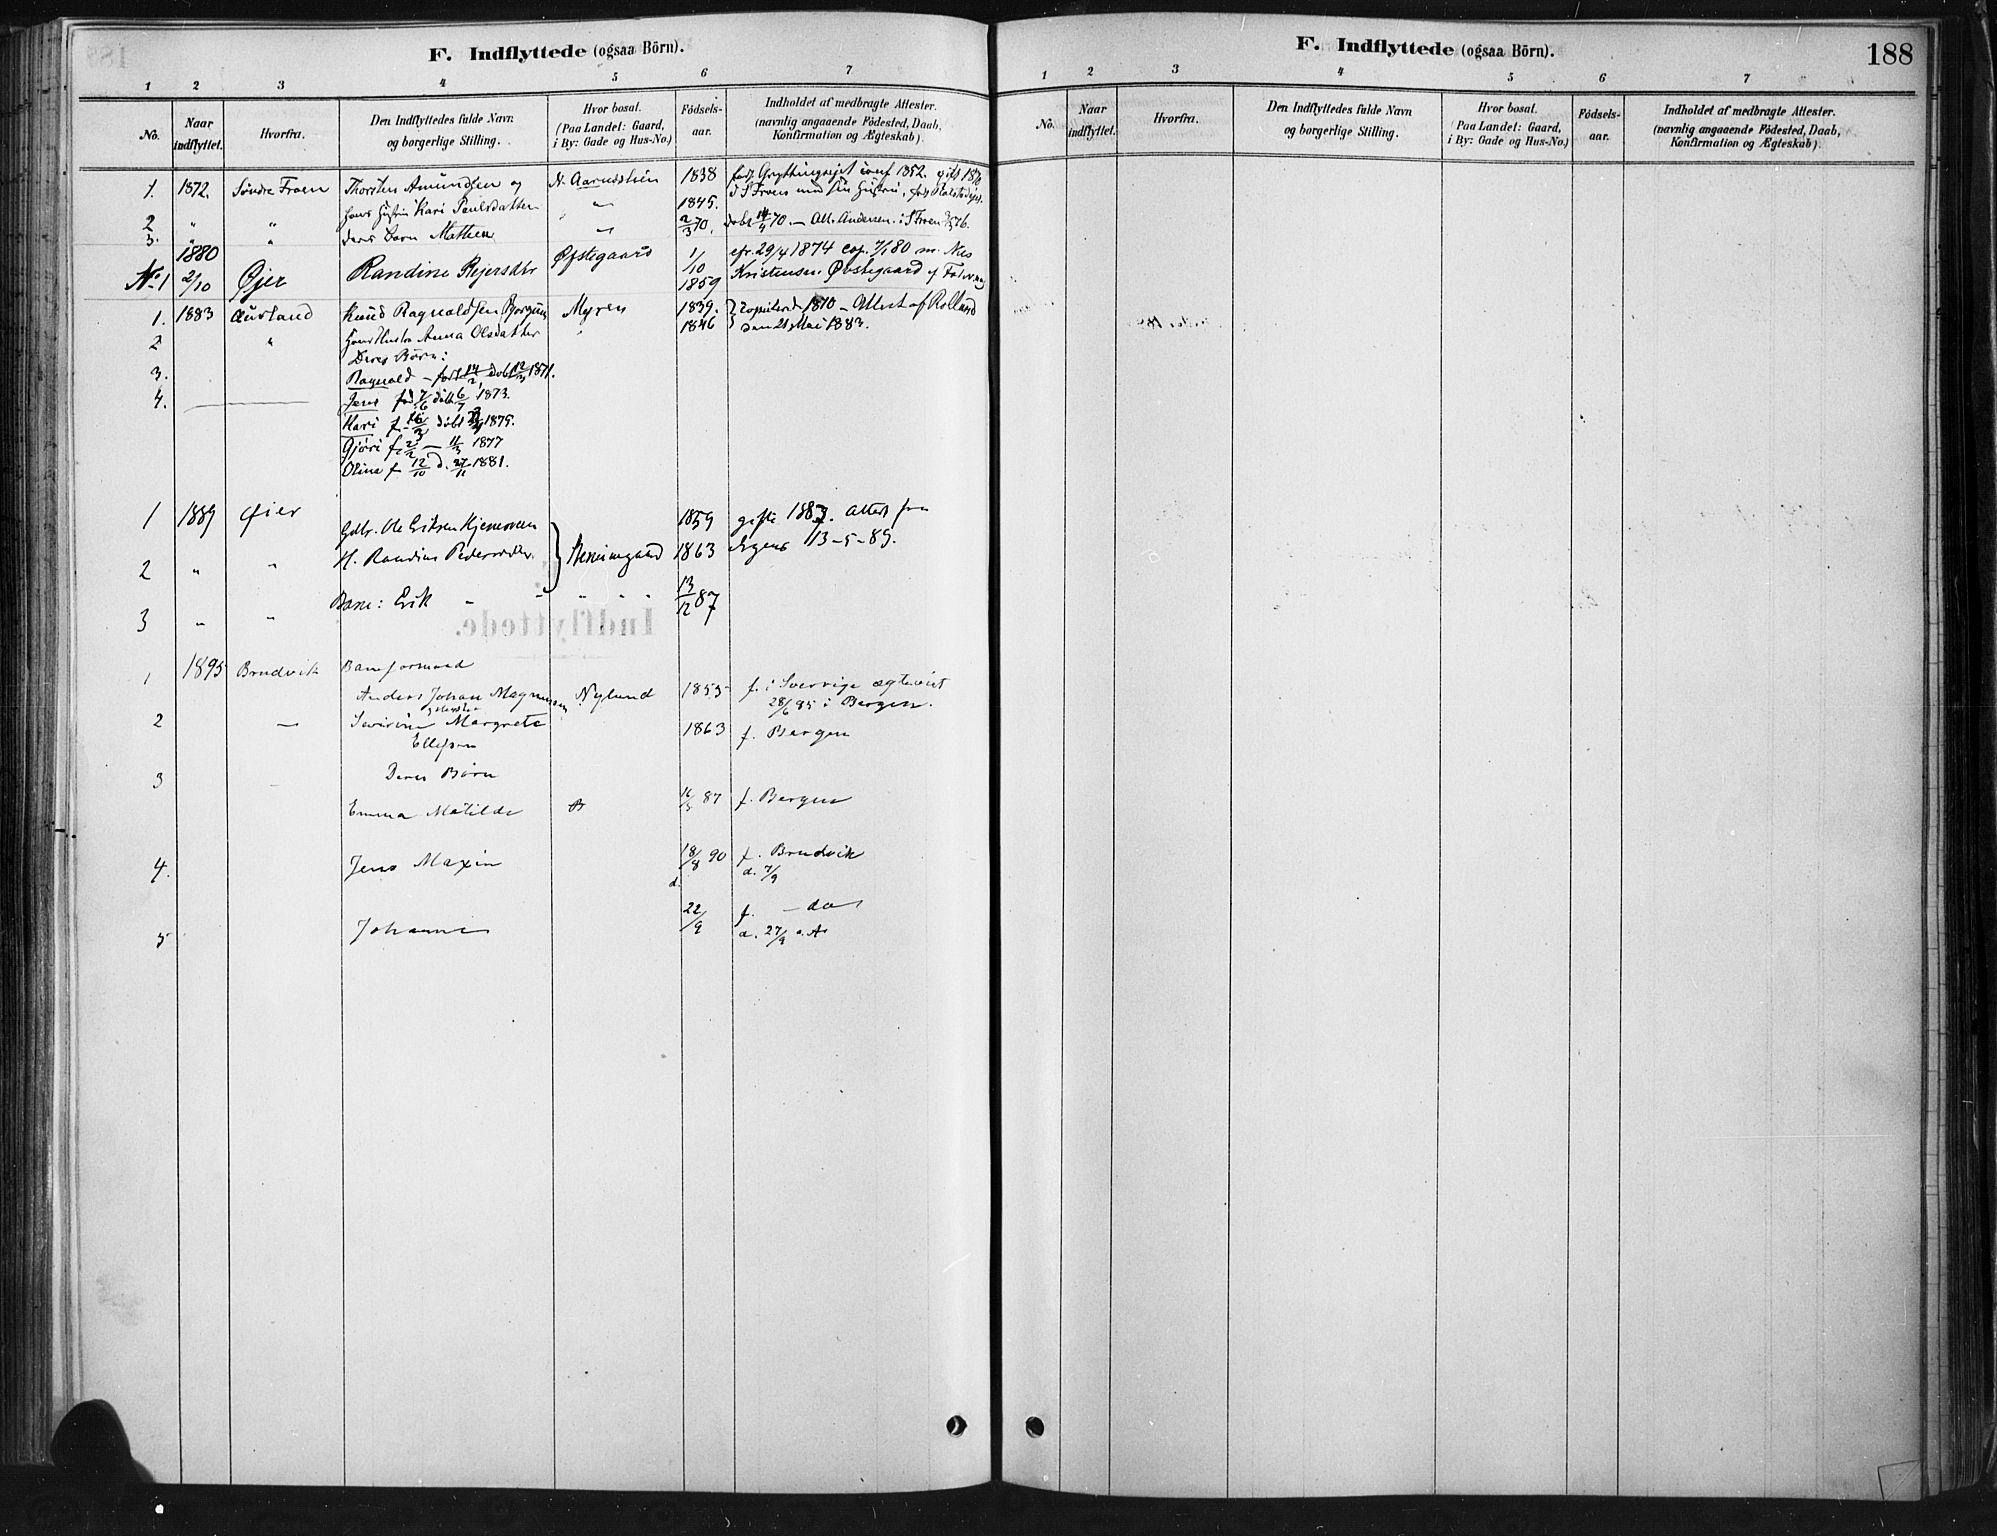 SAH, Ringebu prestekontor, Ministerialbok nr. 9, 1878-1898, s. 188